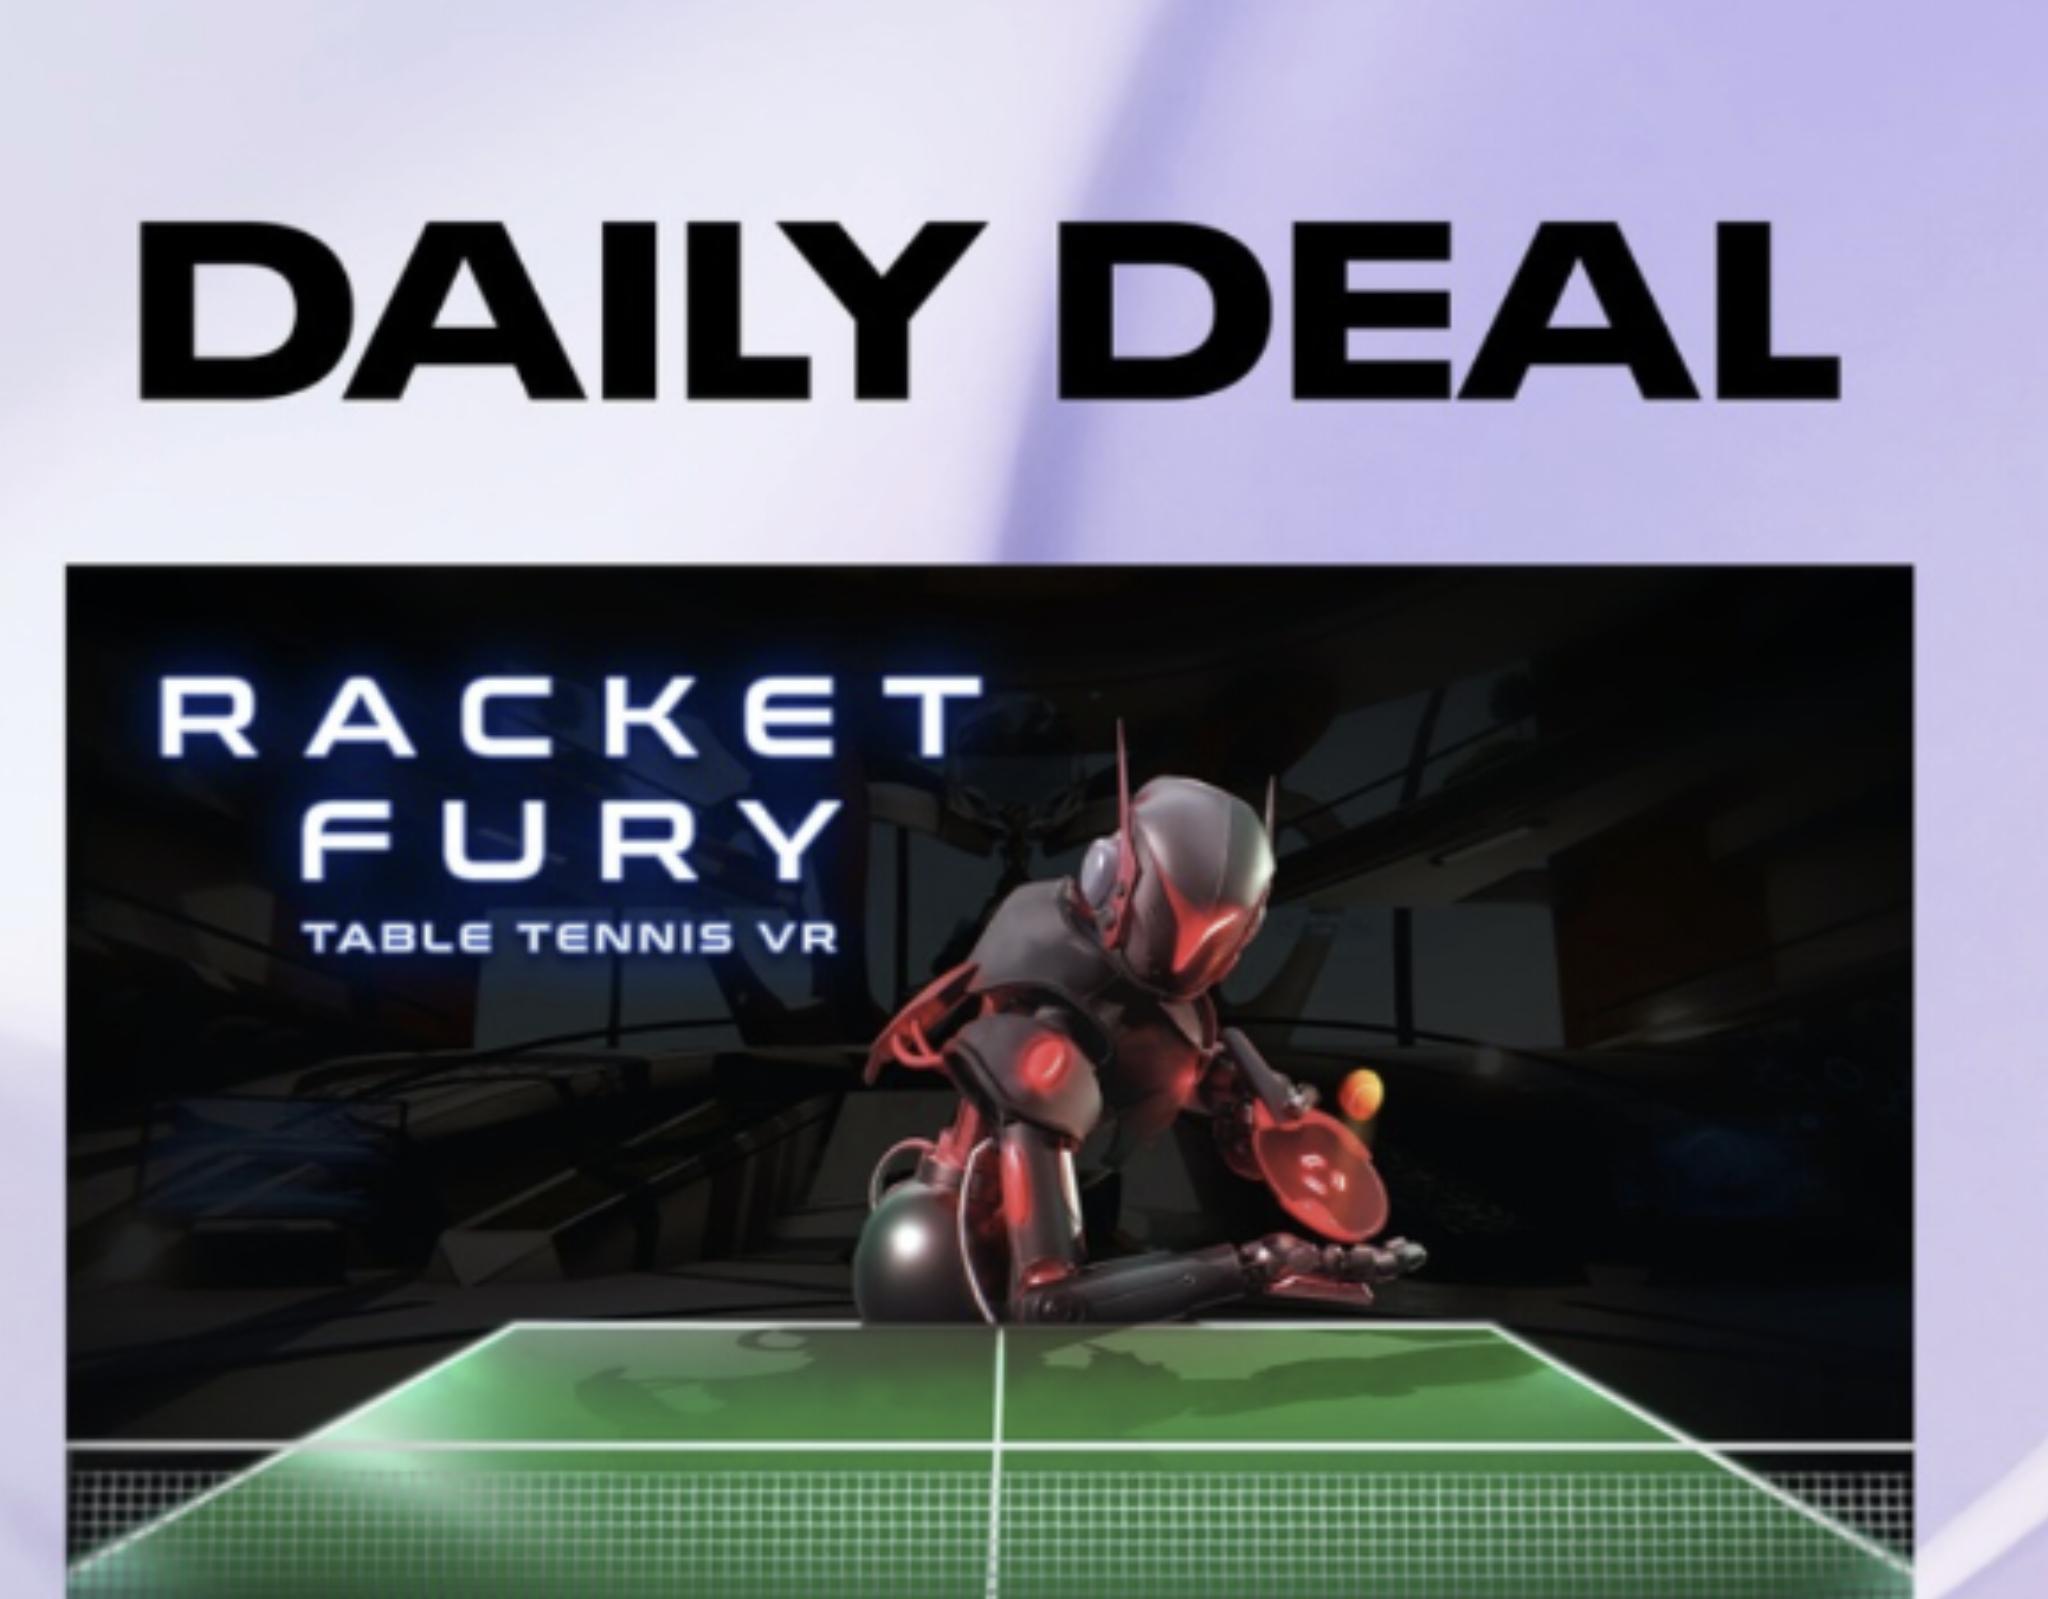 Oculus VR Daily Deal - Racket Fury Table Tennis VR £10.49 @ Oculus